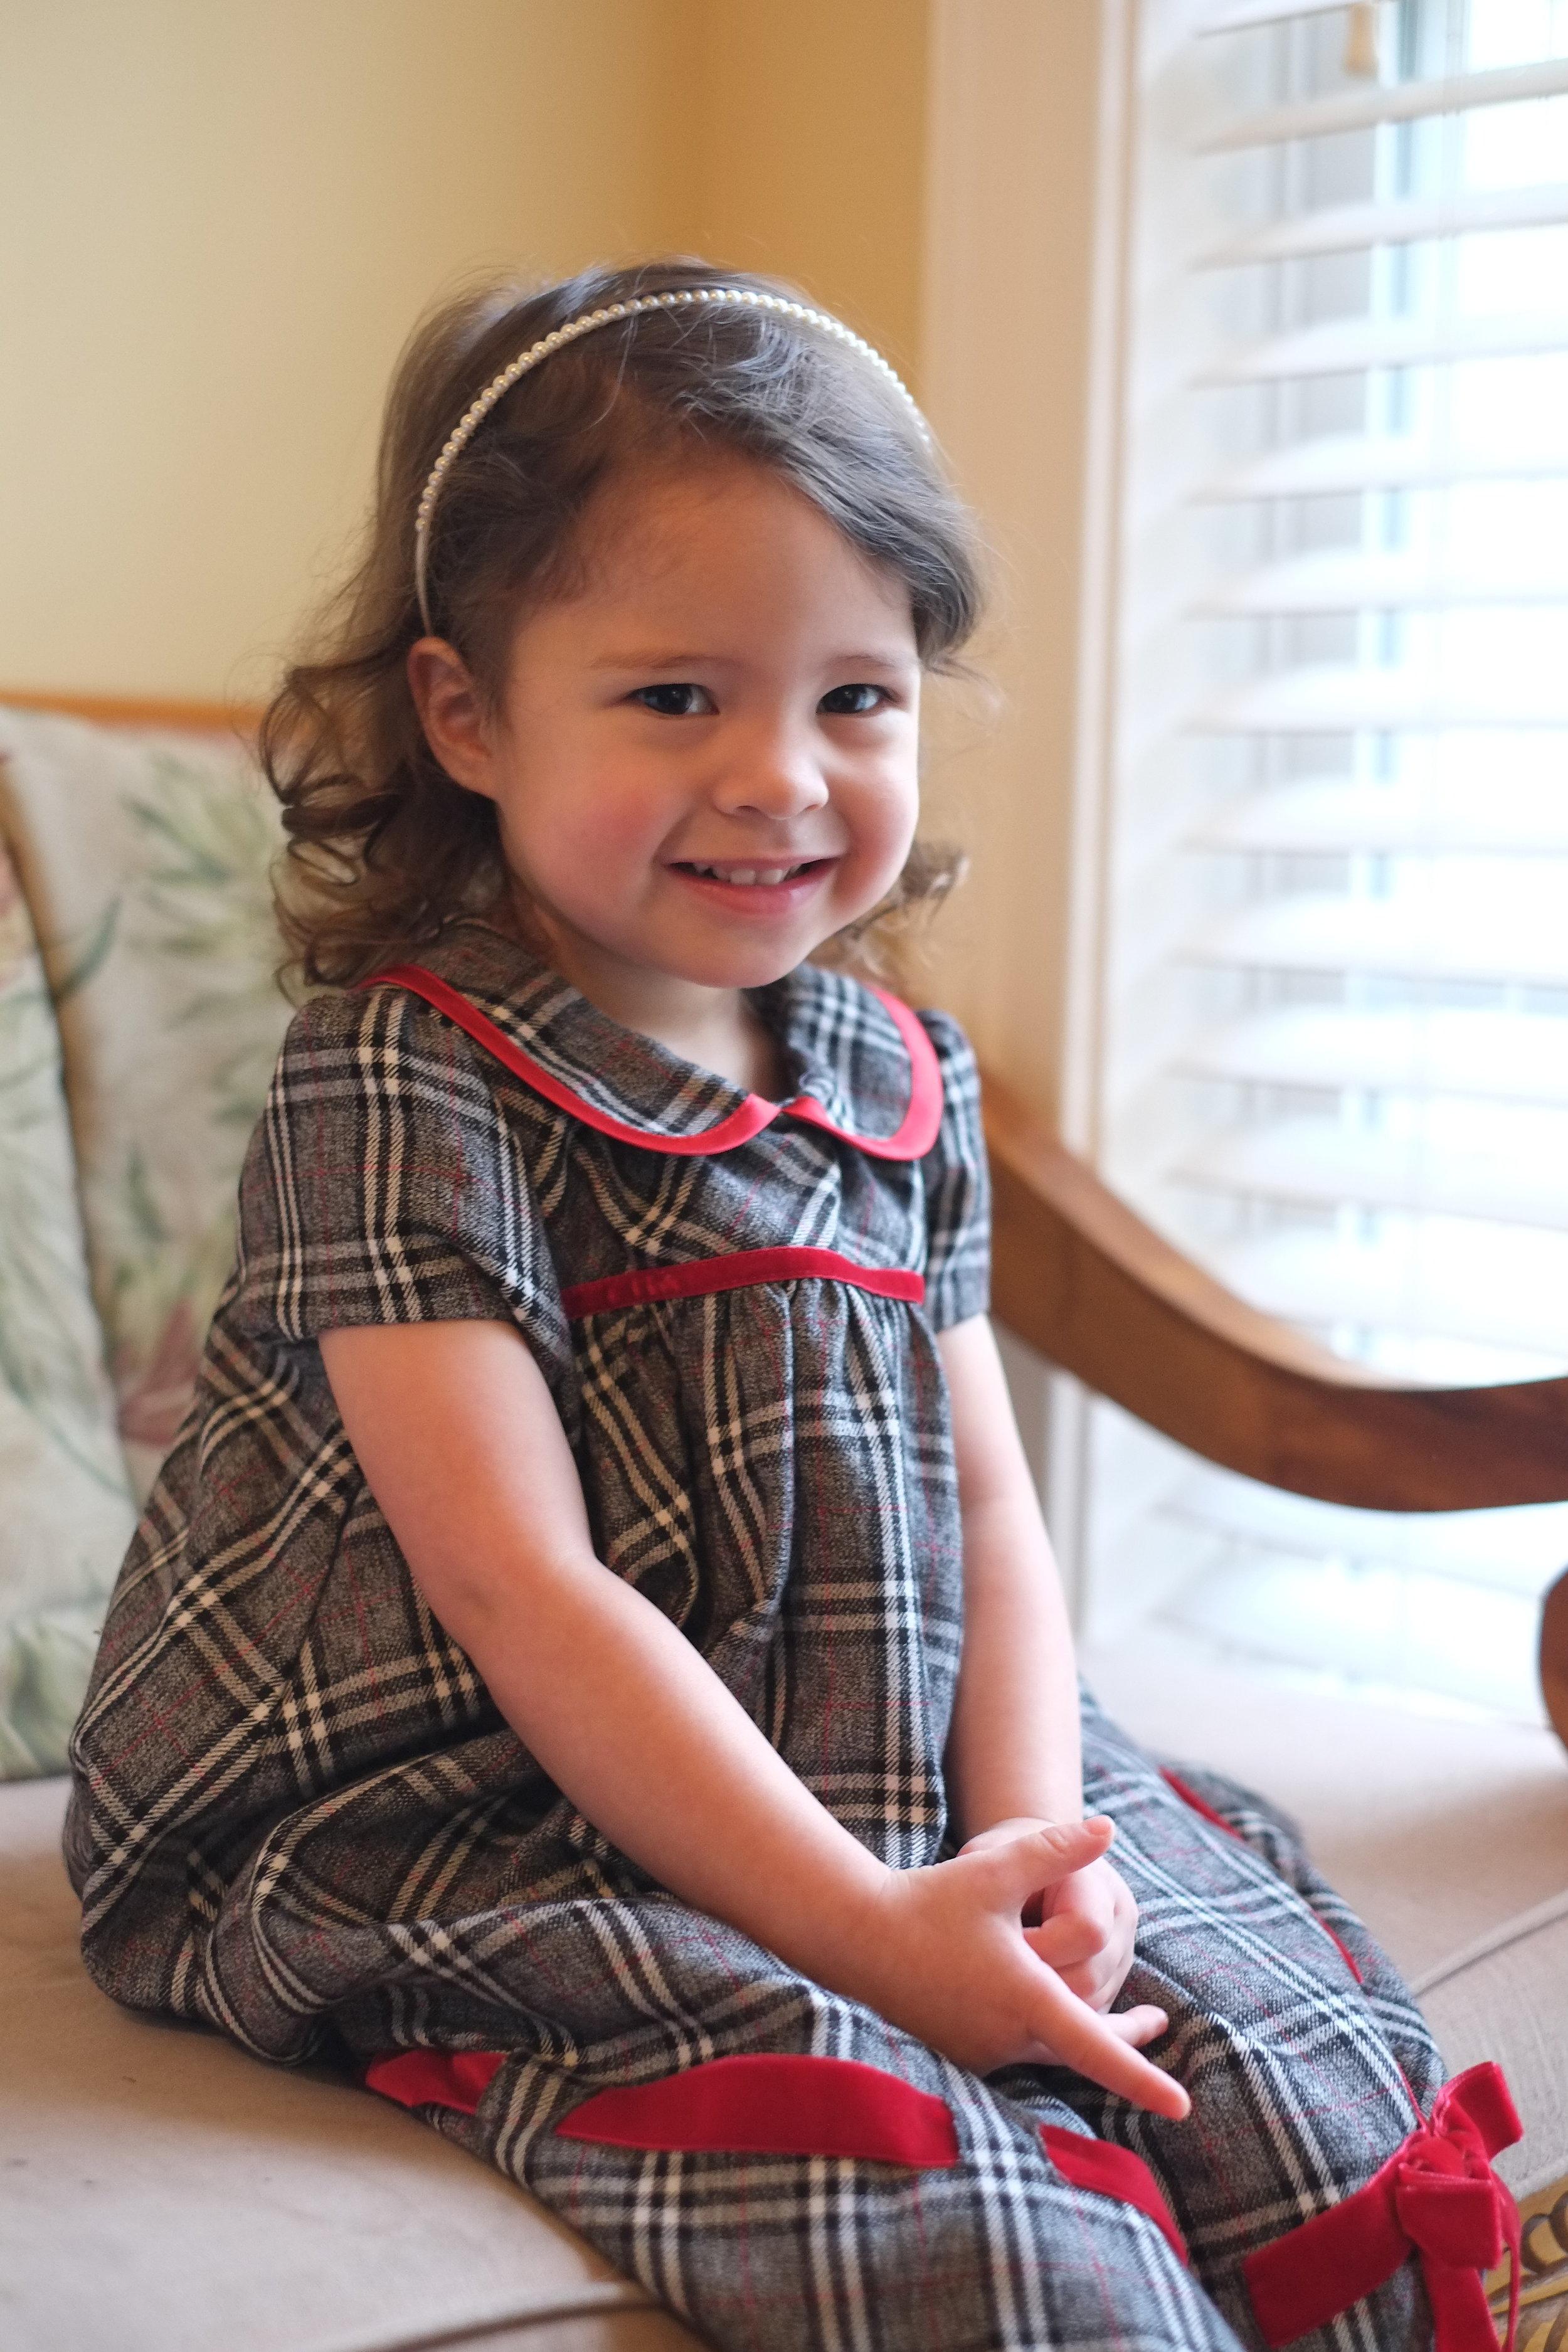 Shiloh-Chattanooga-cutie.JPG